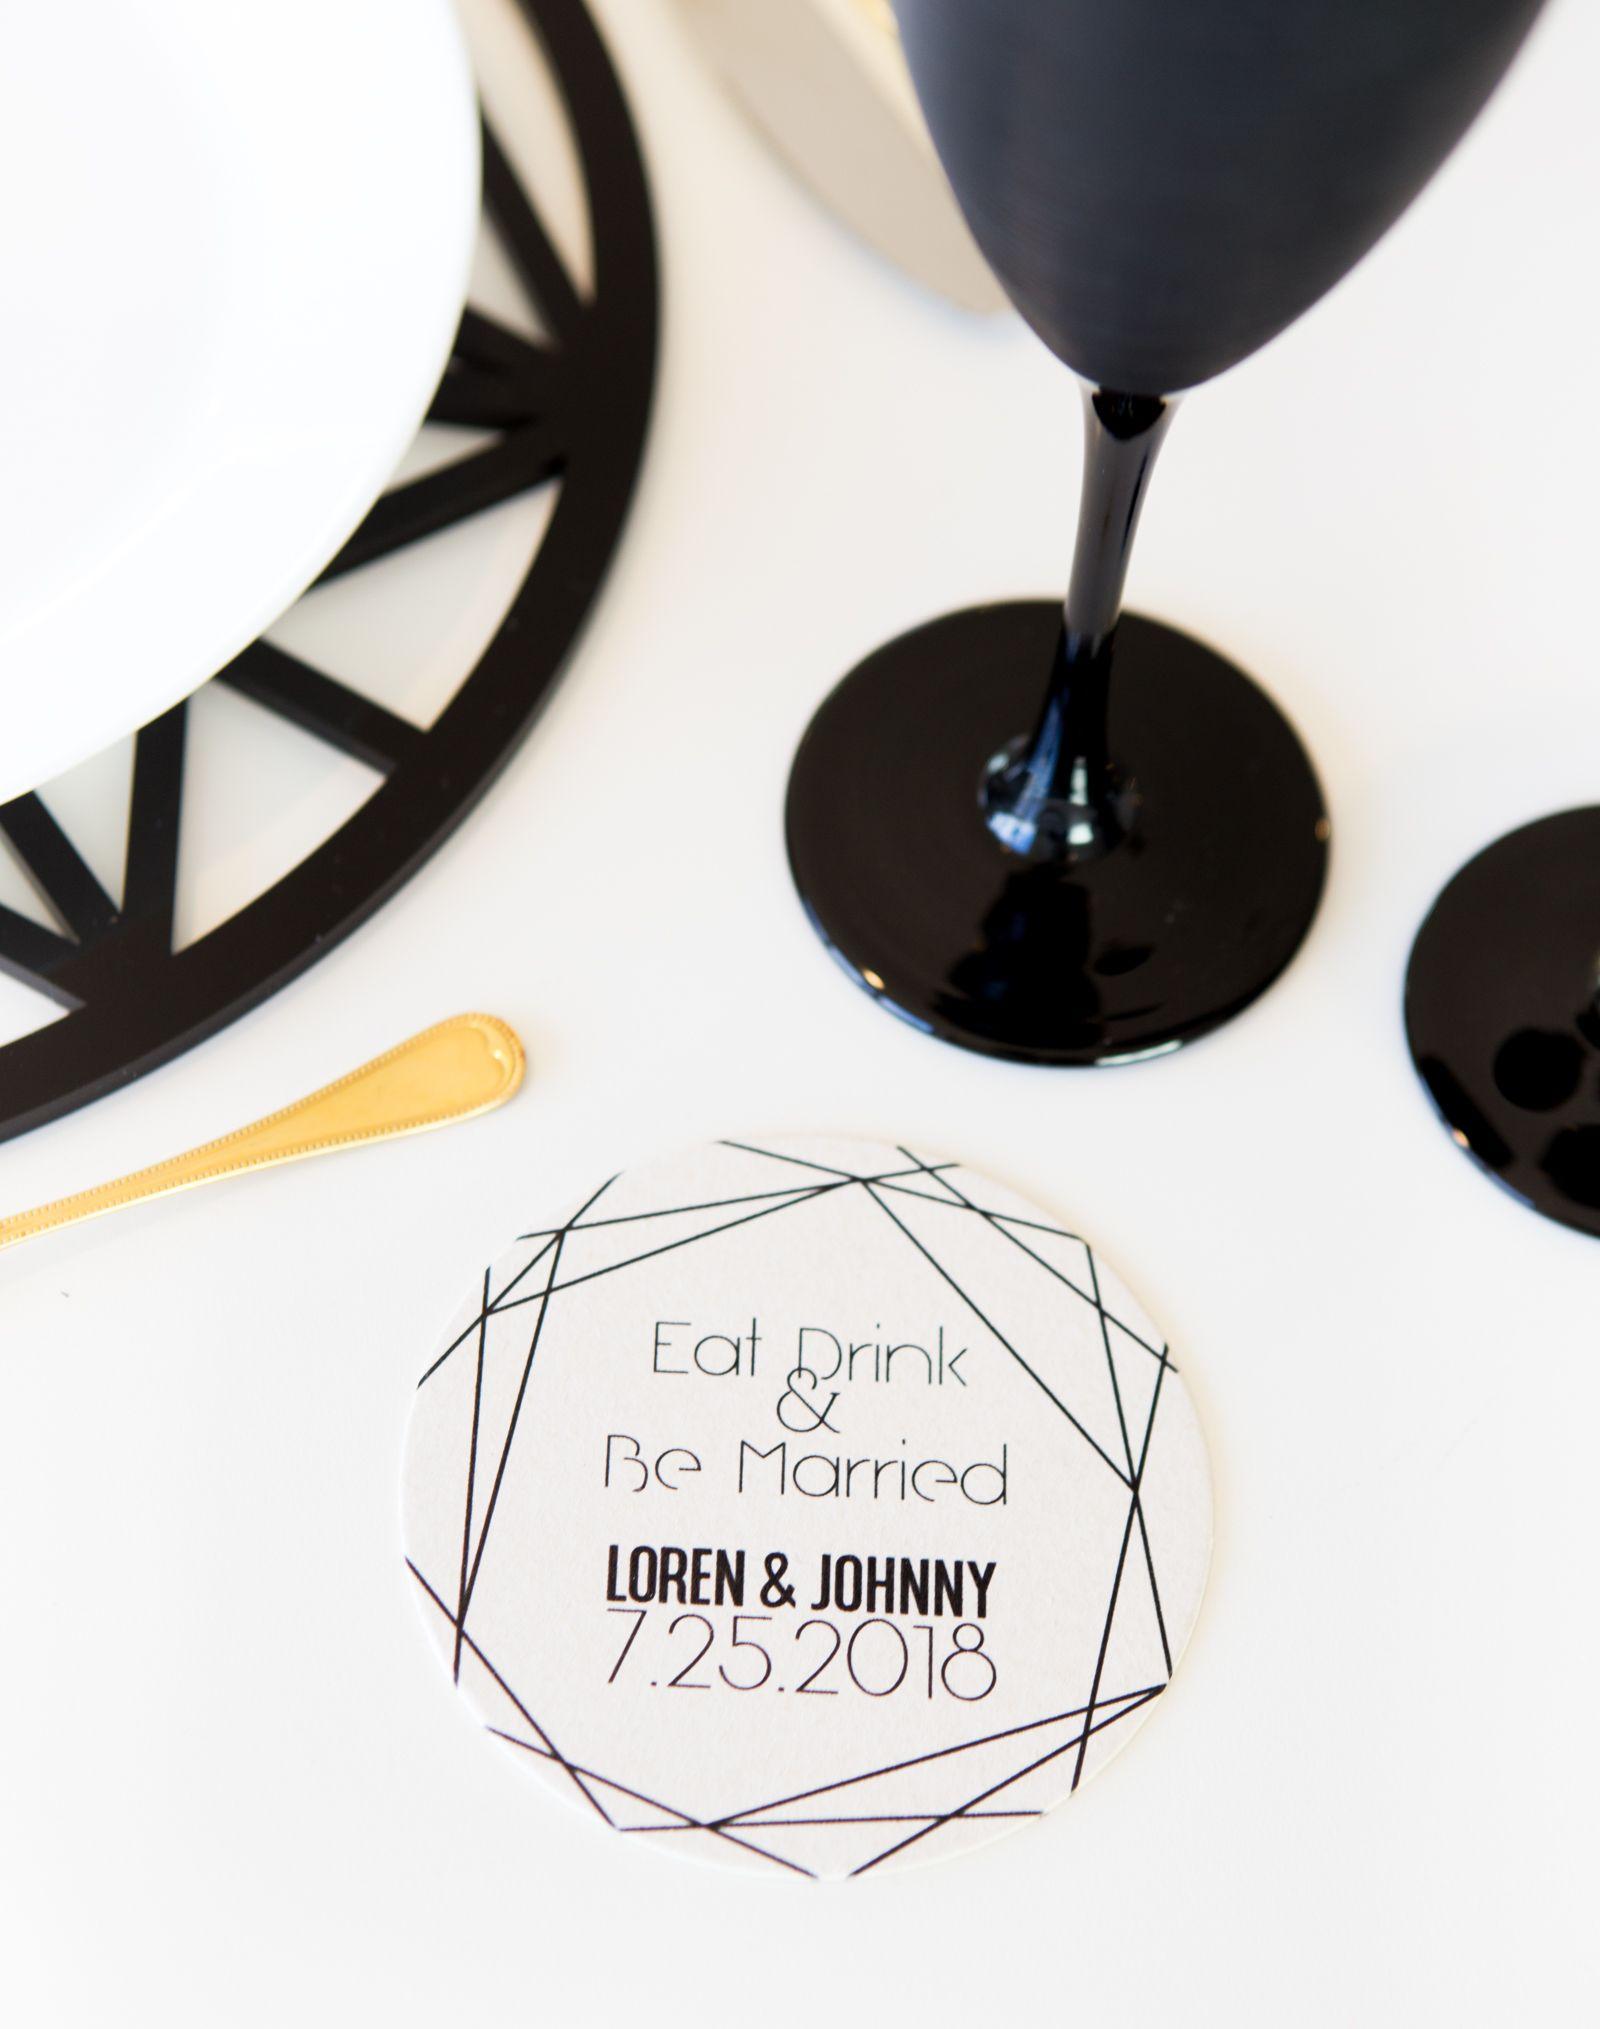 Personalized Geometric Drink Coaster Wedding Favors | Handmade ...